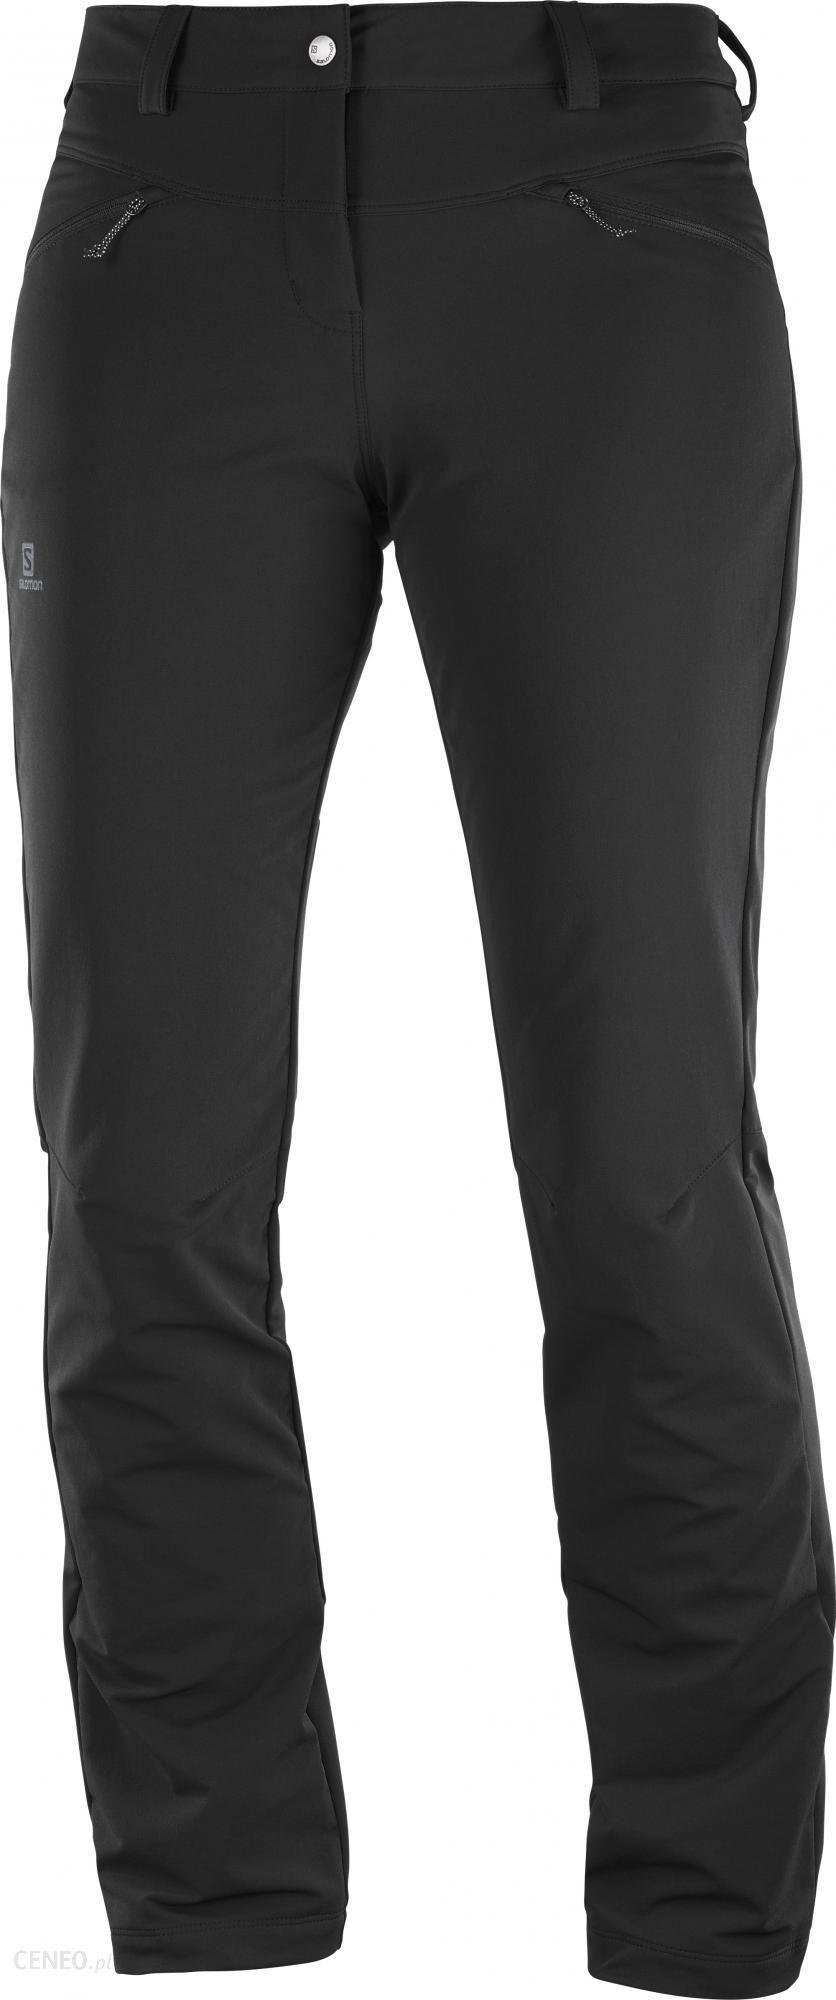 Klasyczne damskie spodnie Salomon Wayfarer Pant black